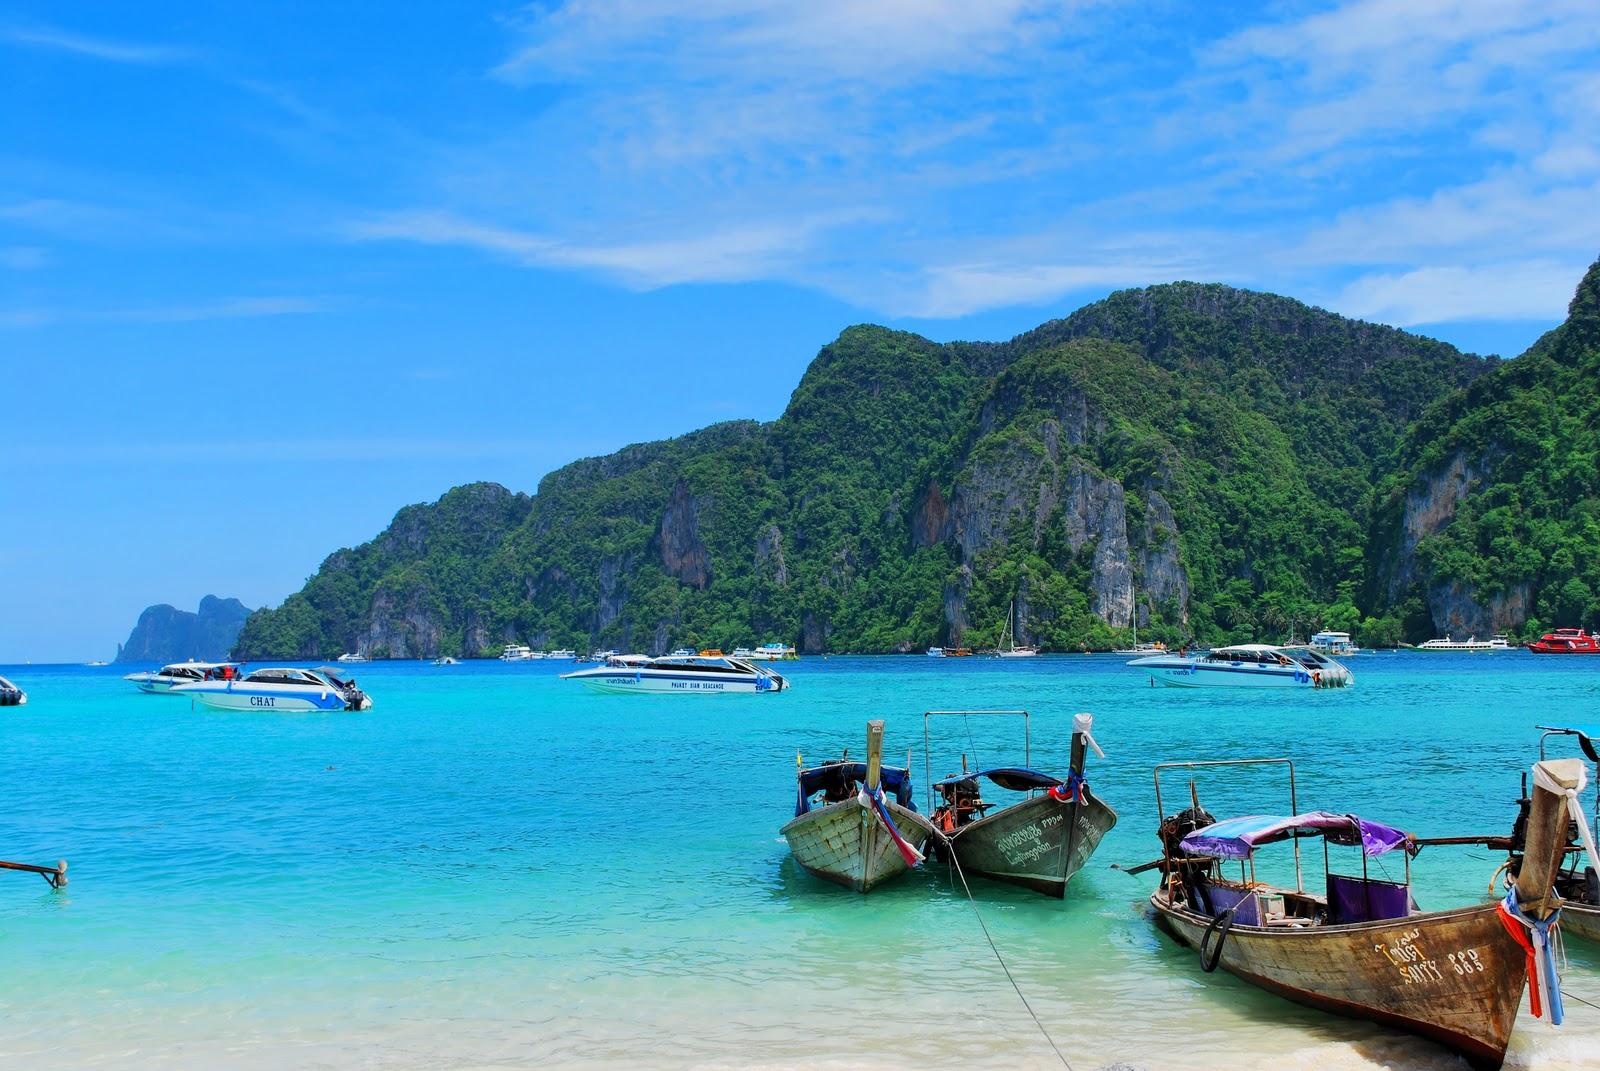 TOP WORLD TRAVEL DESTINATIONS: Krabi